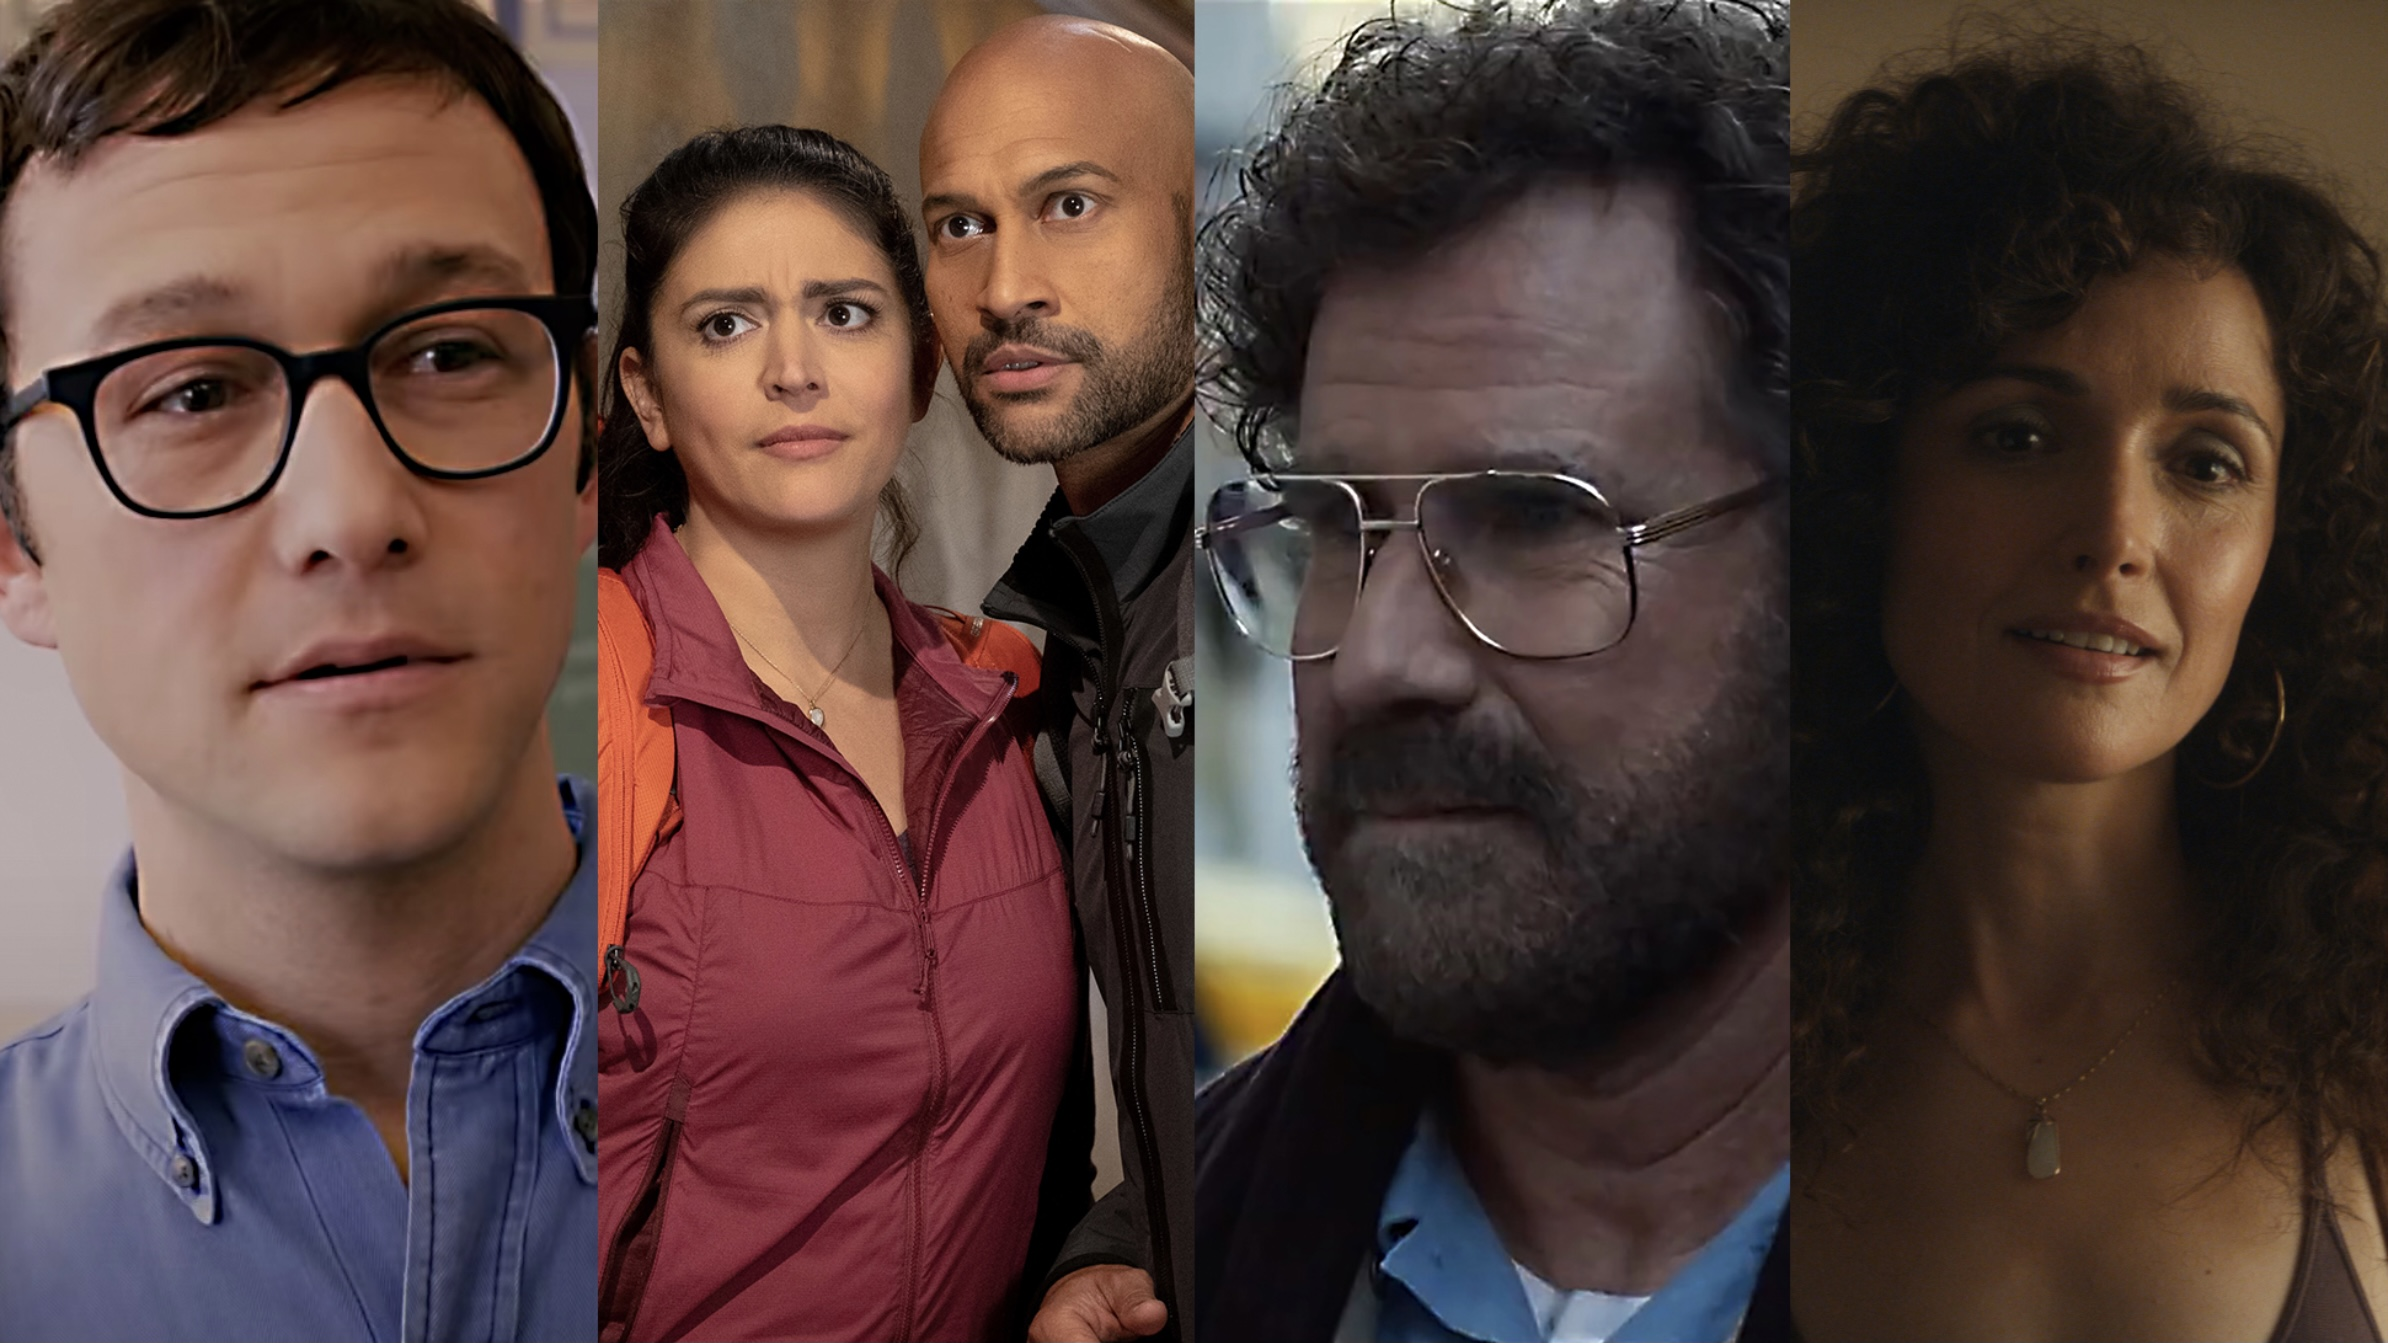 Joseph Gordon-Levitt, Cecily Strong, Keegan-Michael Key, Will Ferrell, Rose Byrne